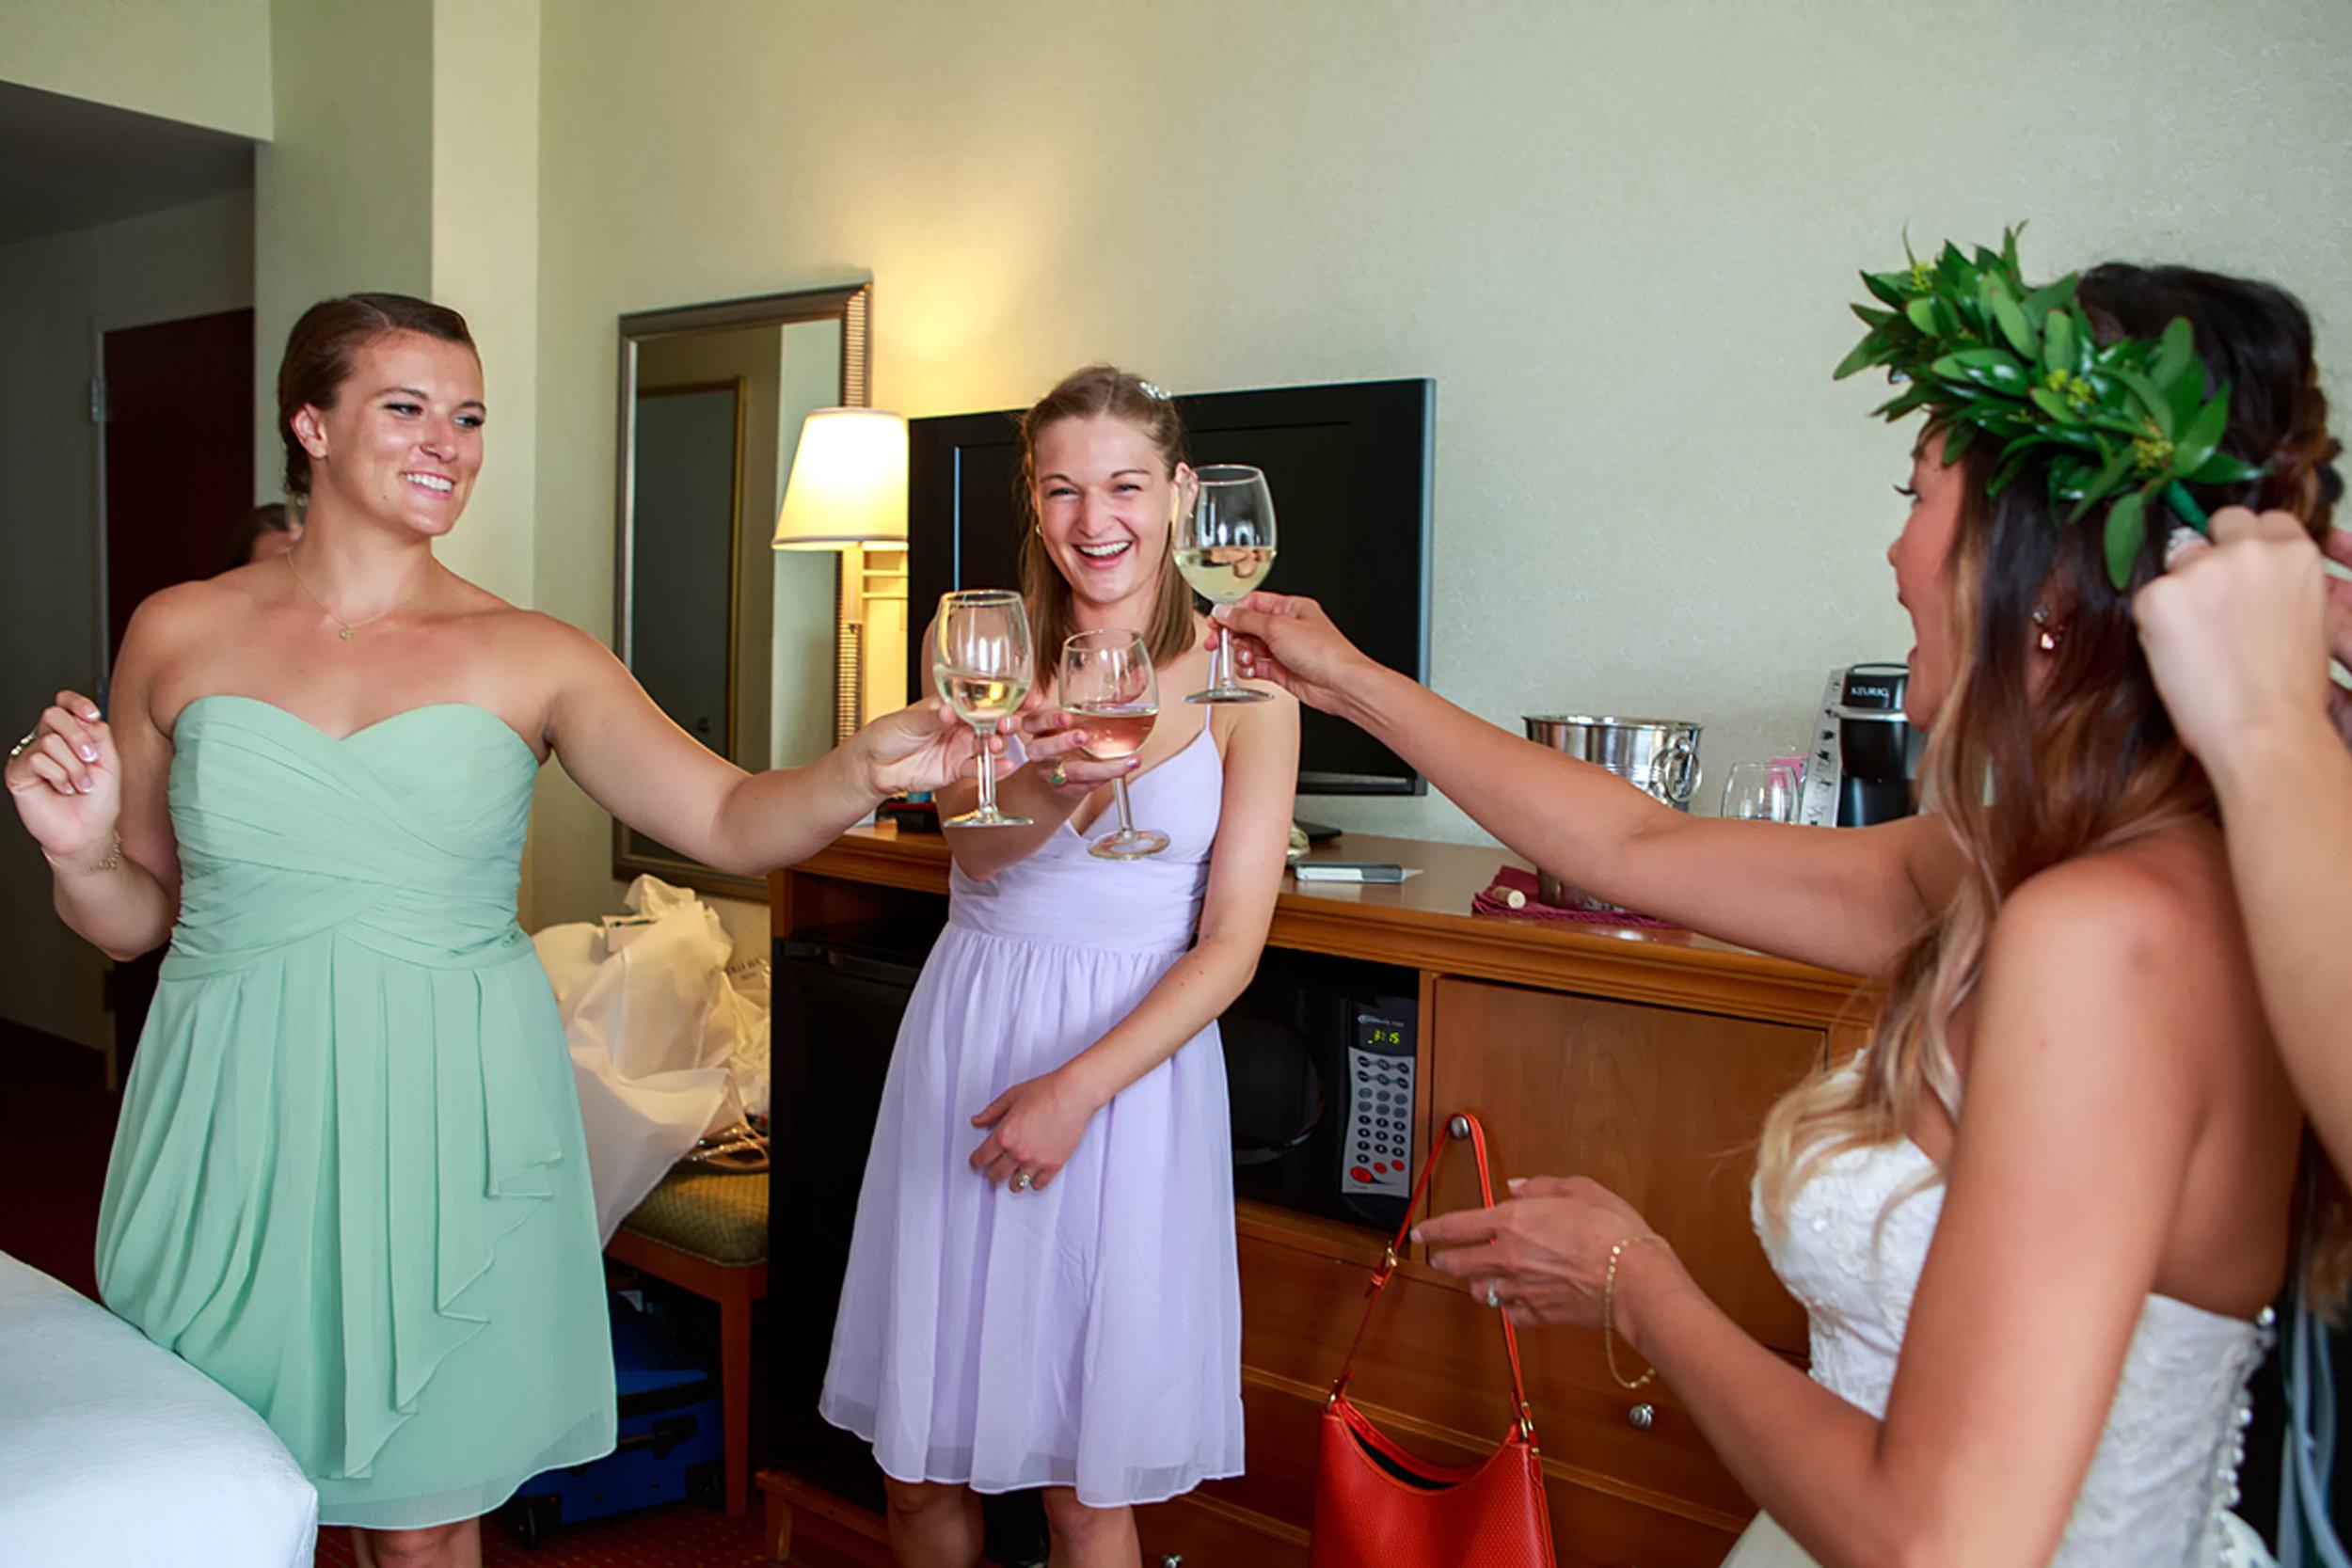 North_Carolina_Wedding_Photographer_Tiffany_Abruzzo_Girls_89.jpg